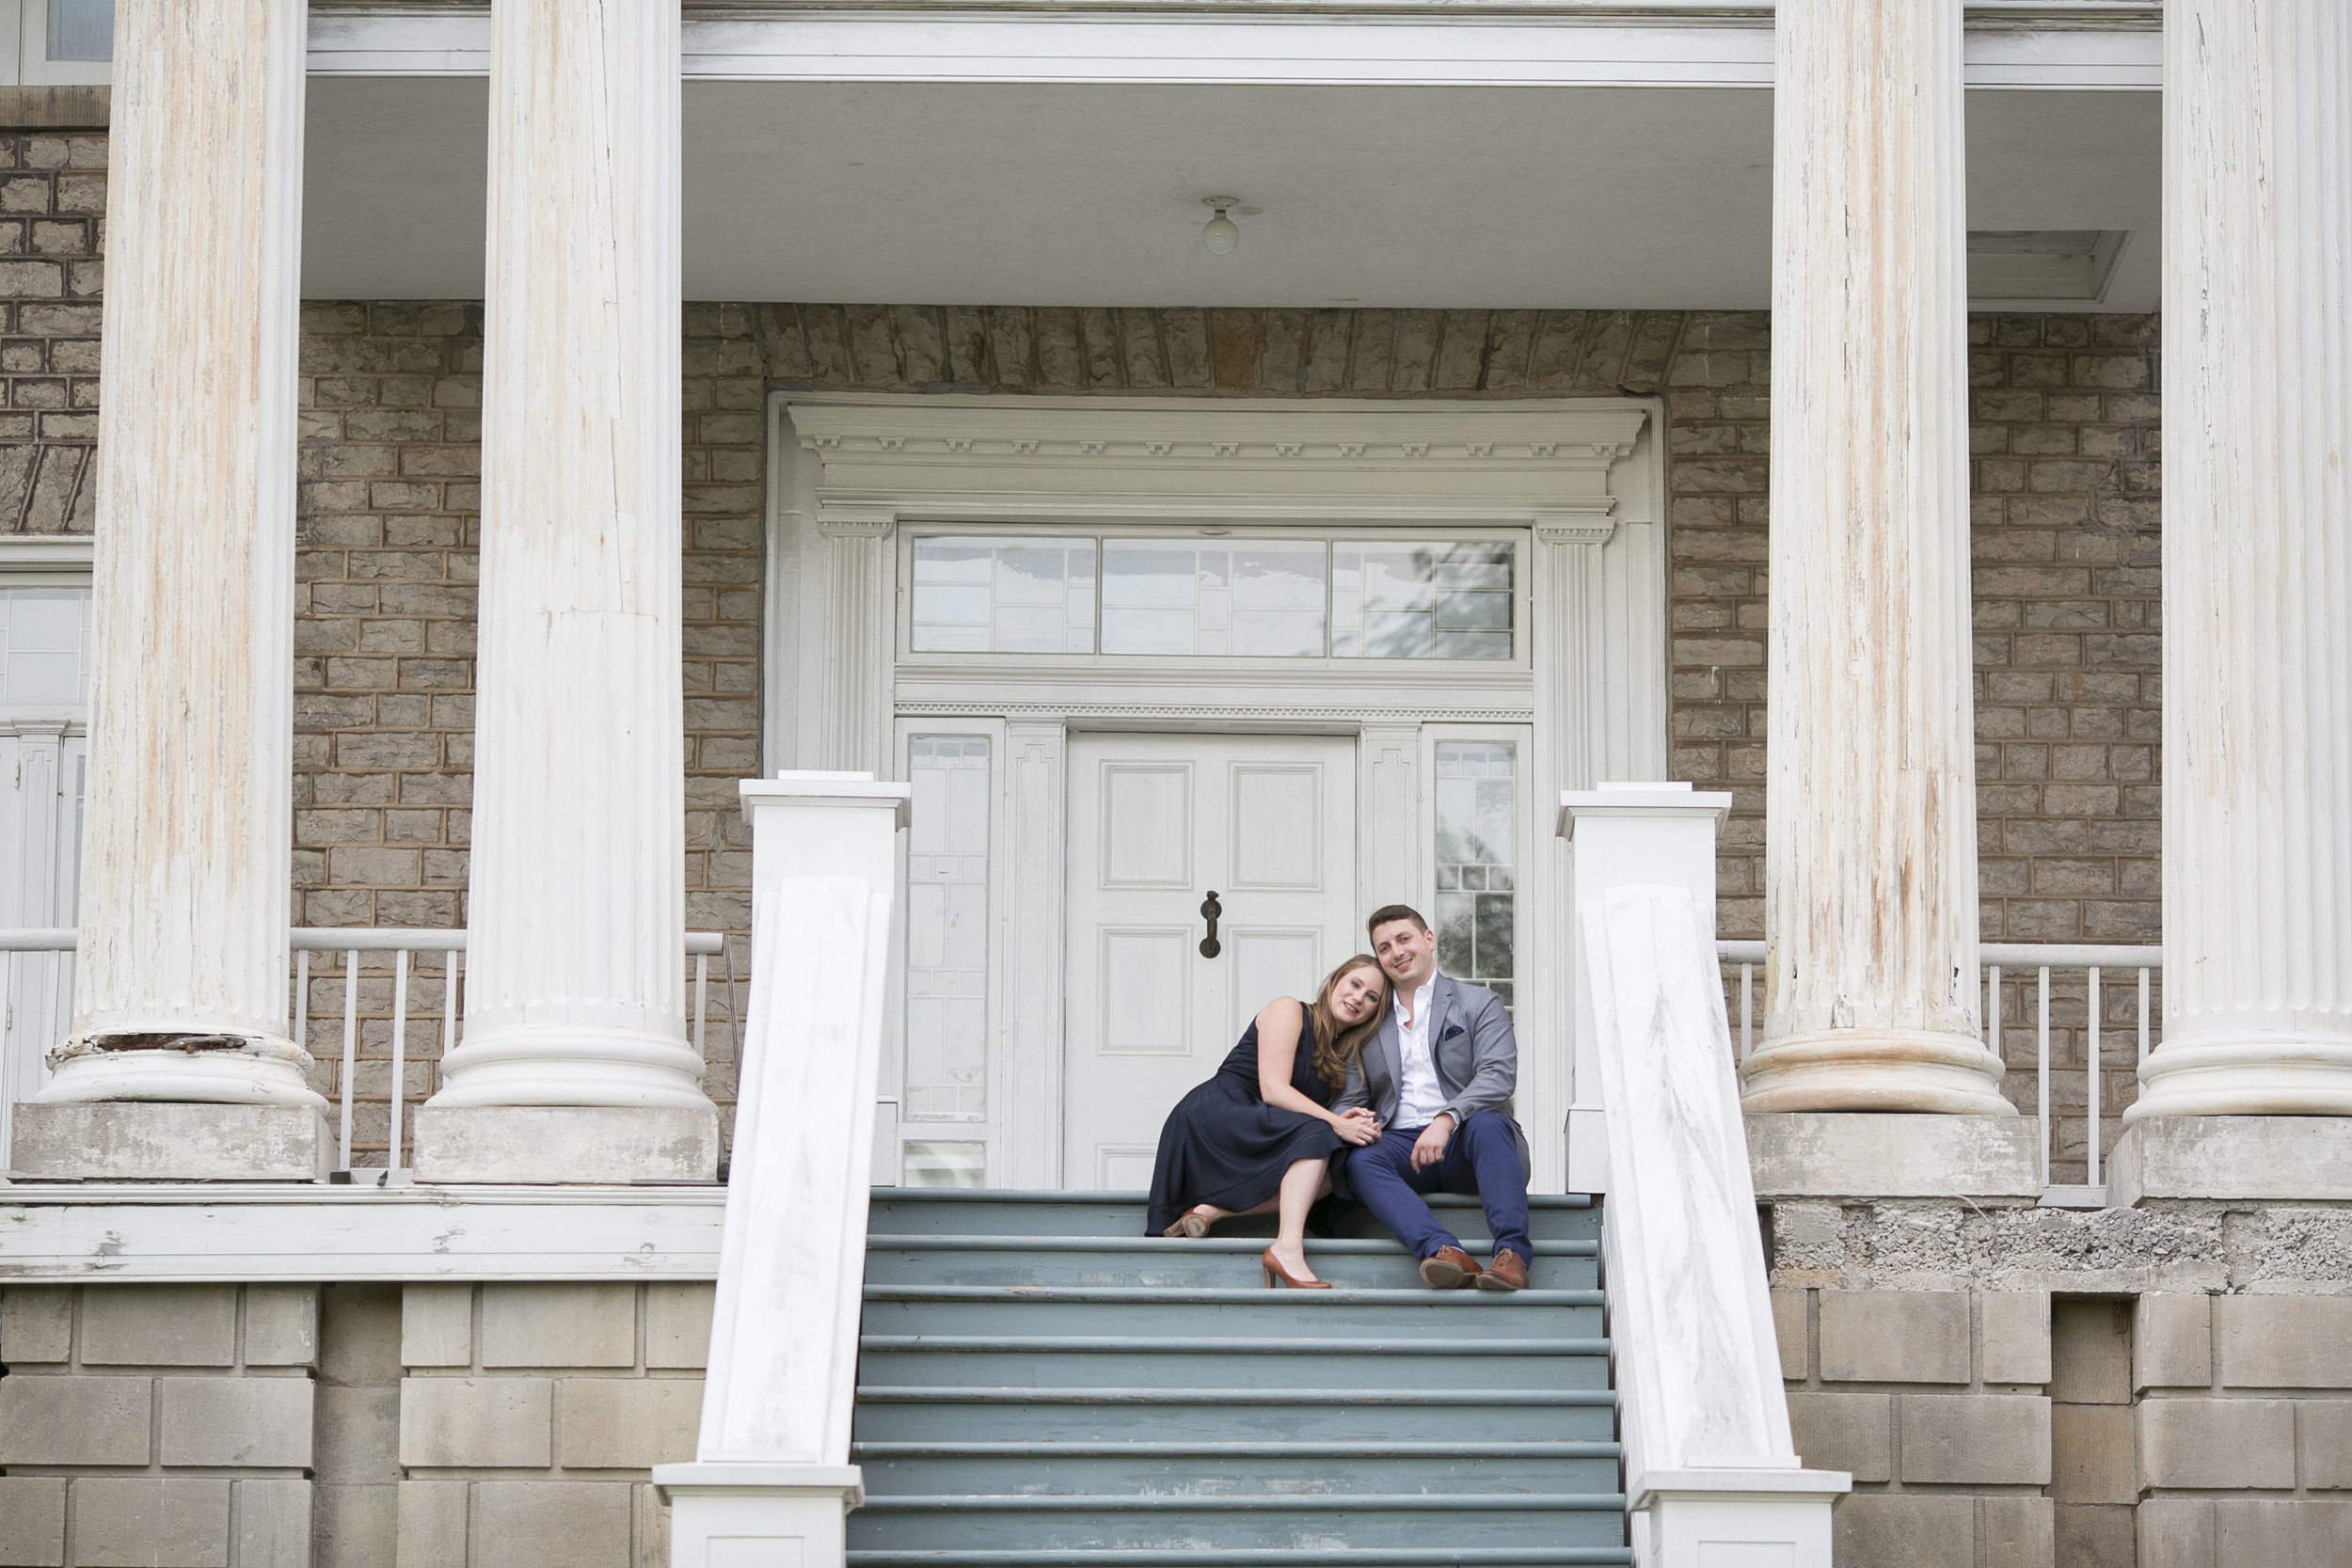 Niagara-on-the-Lake-Summer-Engagement-photos-by-Philosophy-Studios015.JPG